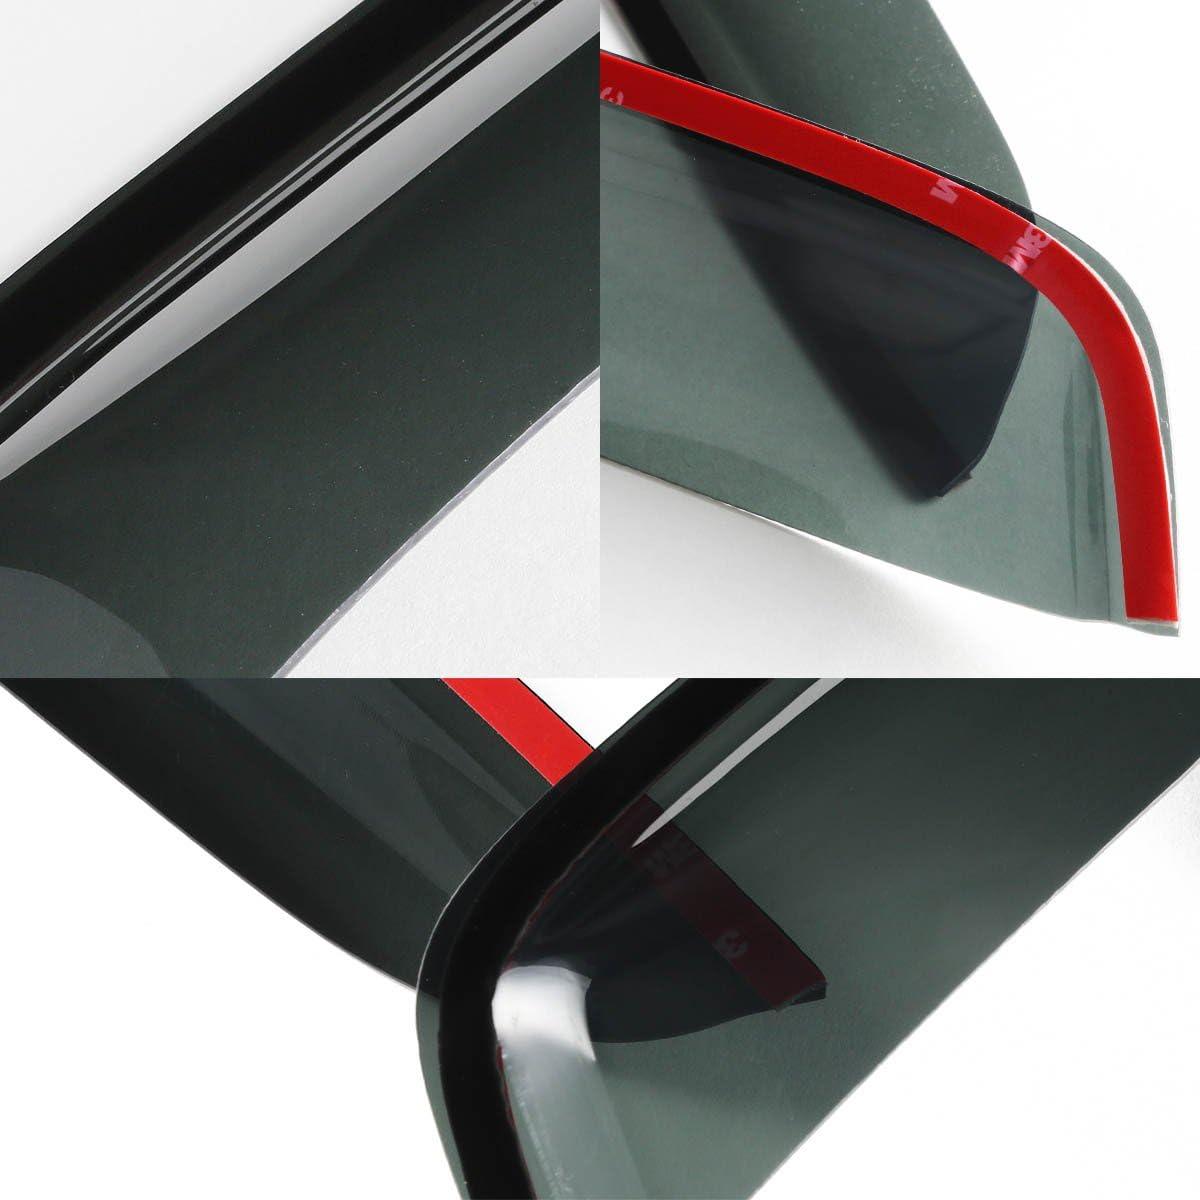 ,Dark Smoke 12-17 Fiat 500 2-Dr Coupe DNA MOTORING WVS-T2-0023 Window Visor Deflector Rain Guard